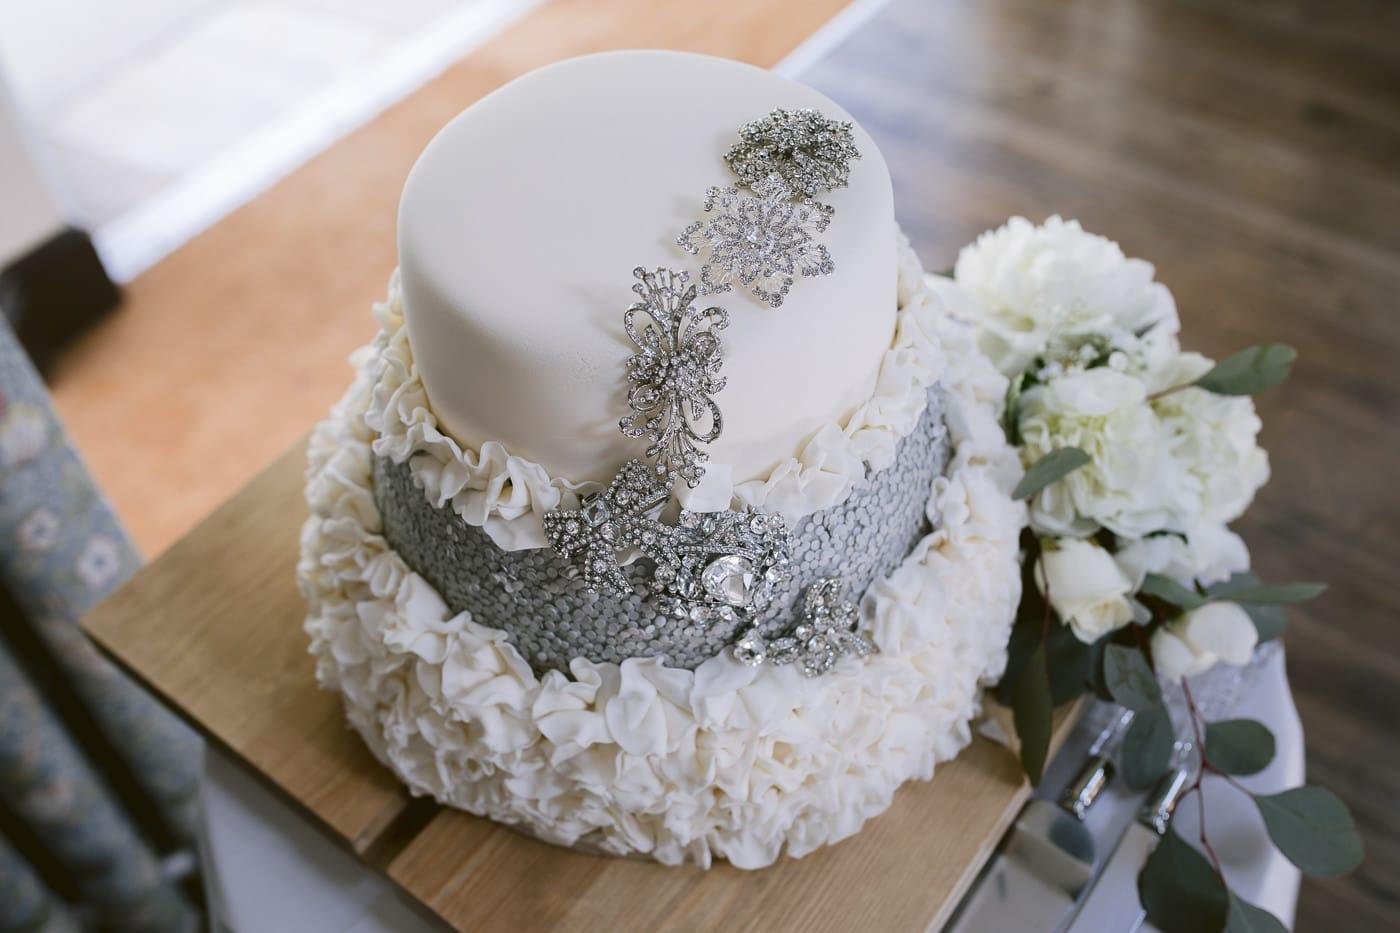 Decorative Irton Hall Wedding Cake Photo Shoot Session